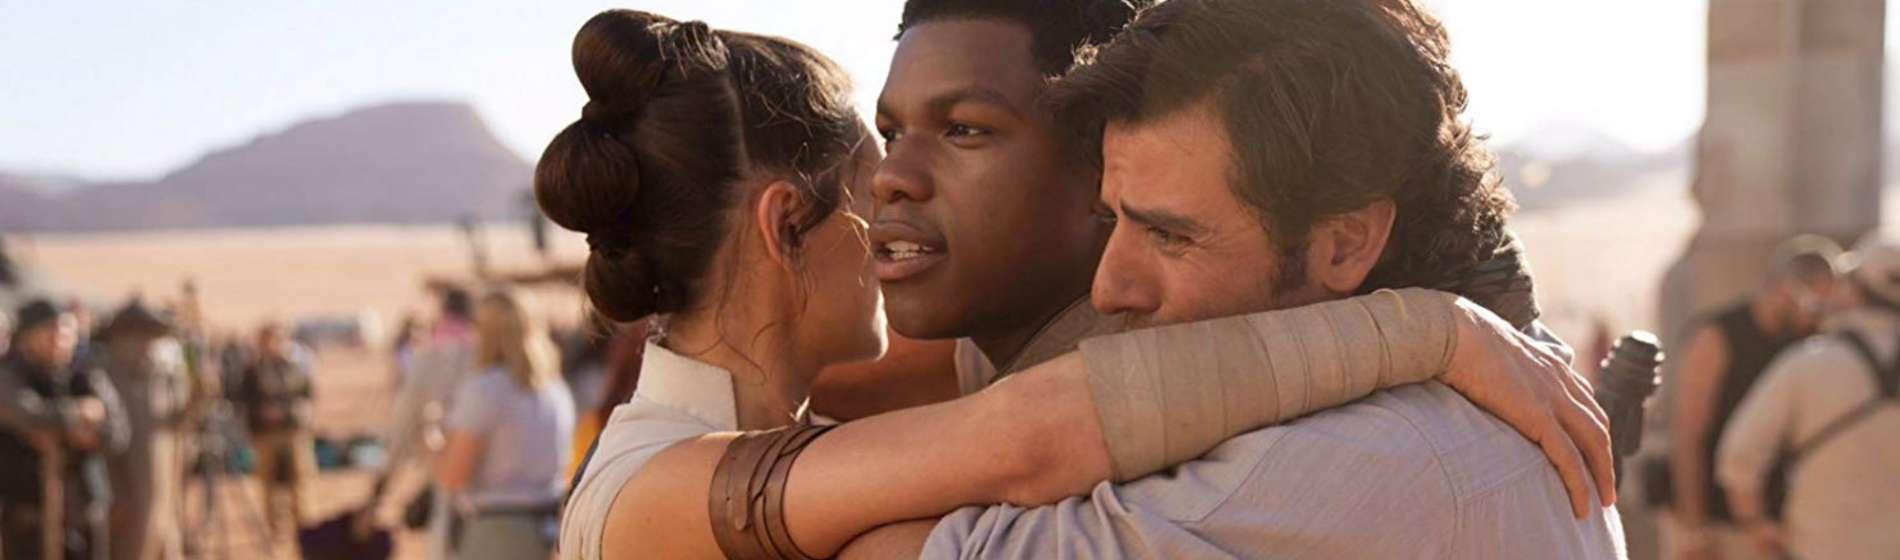 star-wars-the-rise-of-skywalker-group-hug